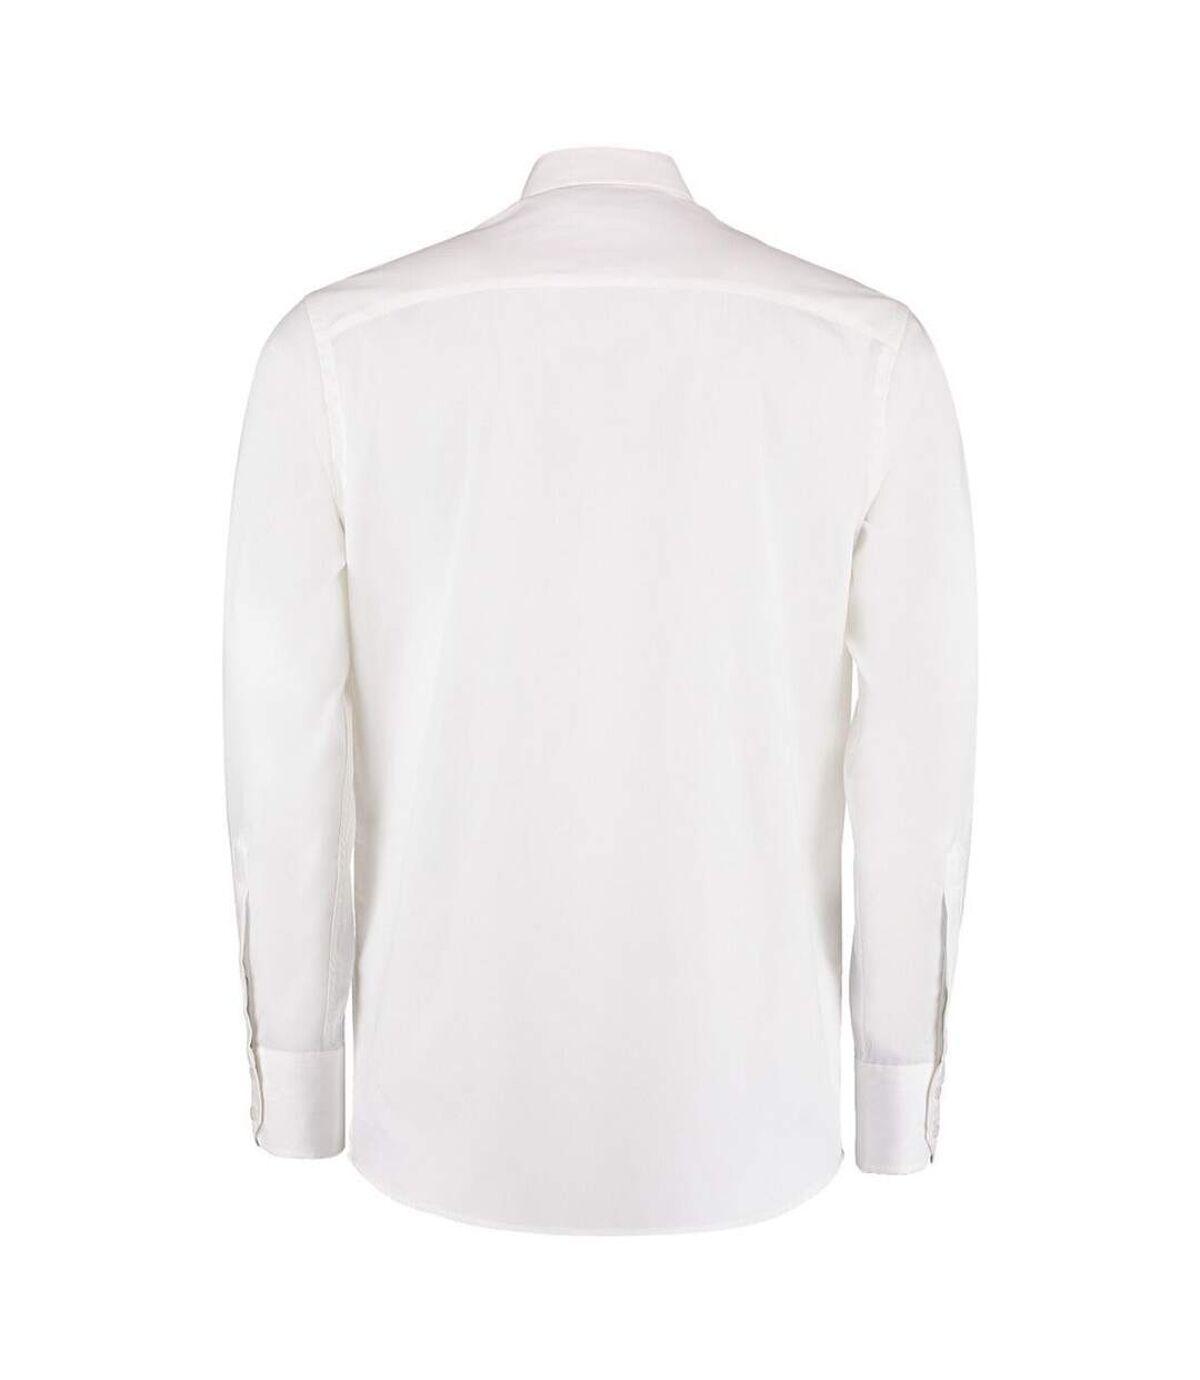 Kustom Kit - Chemise à manches longues - Homme (Blanc) - UTBC1444